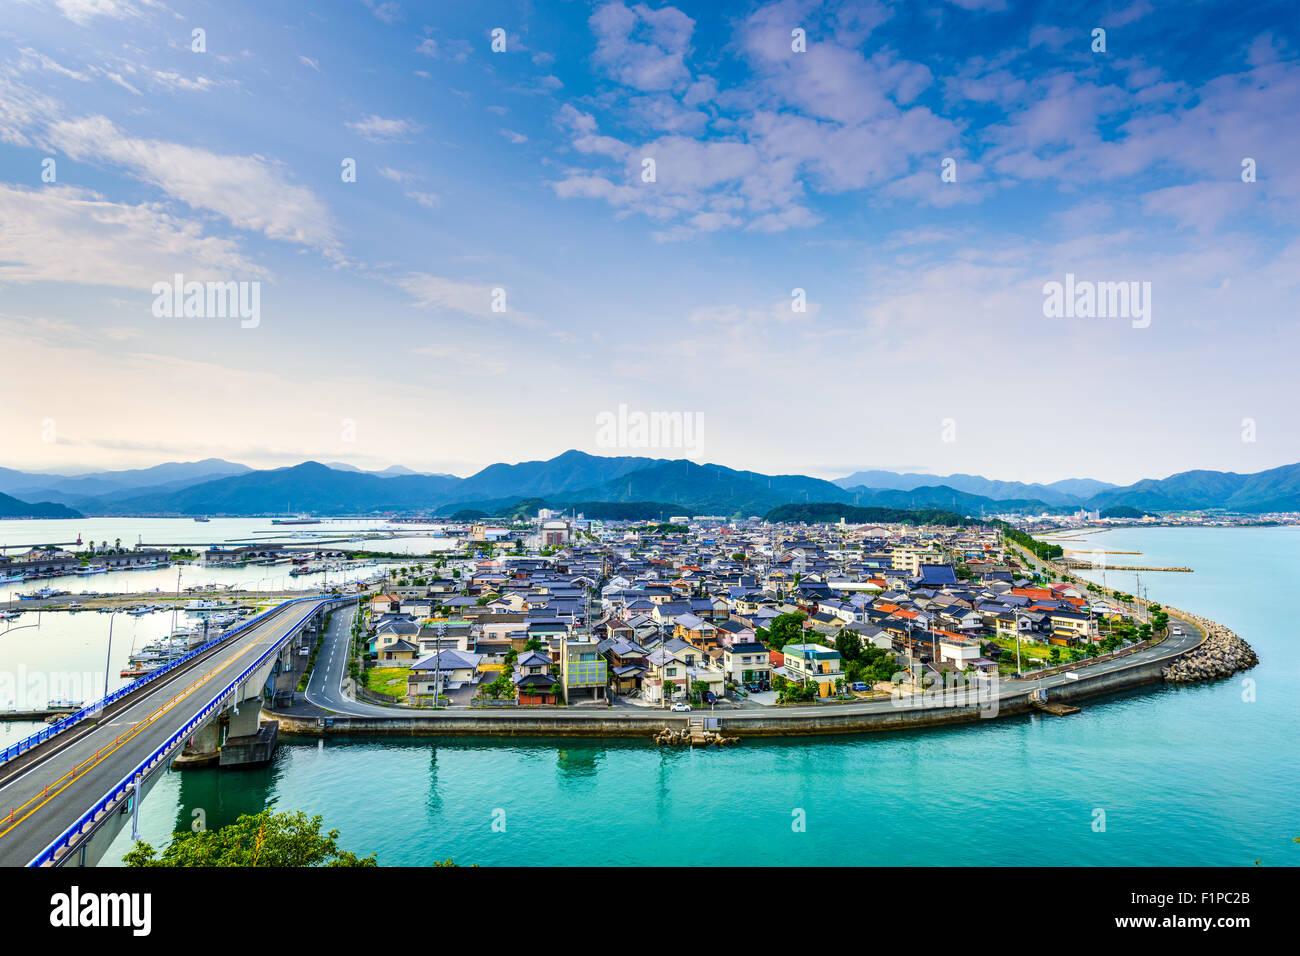 Senzaki, Nagato, Yamaguchi Japan town view. - Stock Image